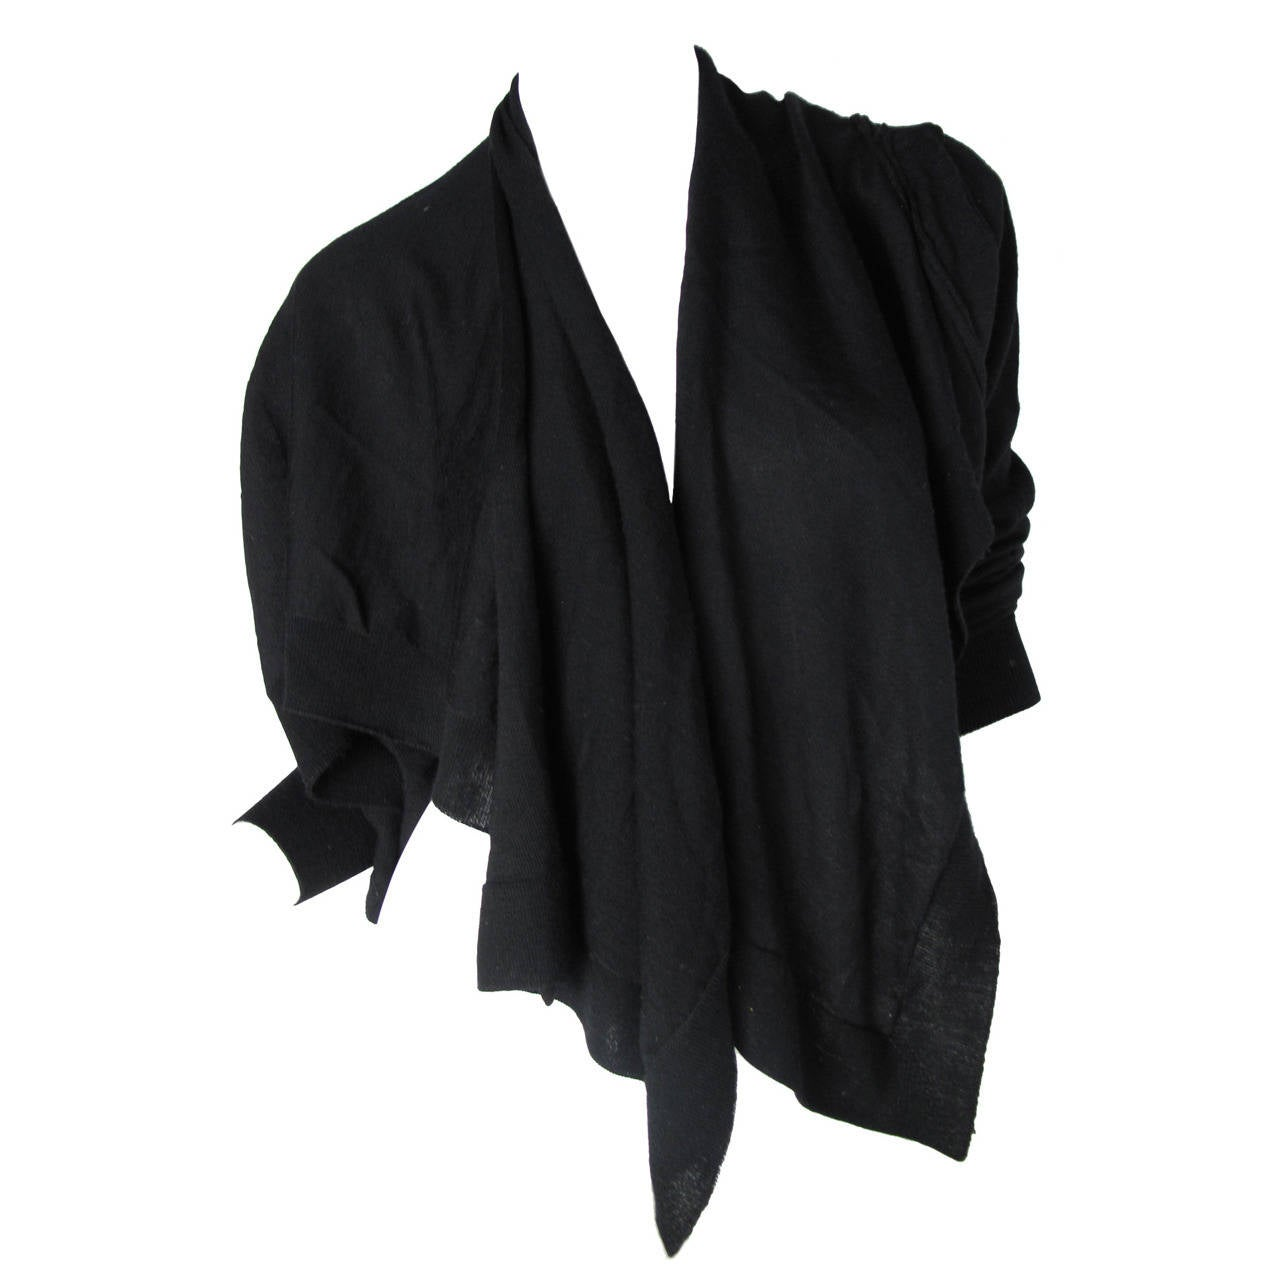 Comme des Garcons Black Wool Cardigan 1